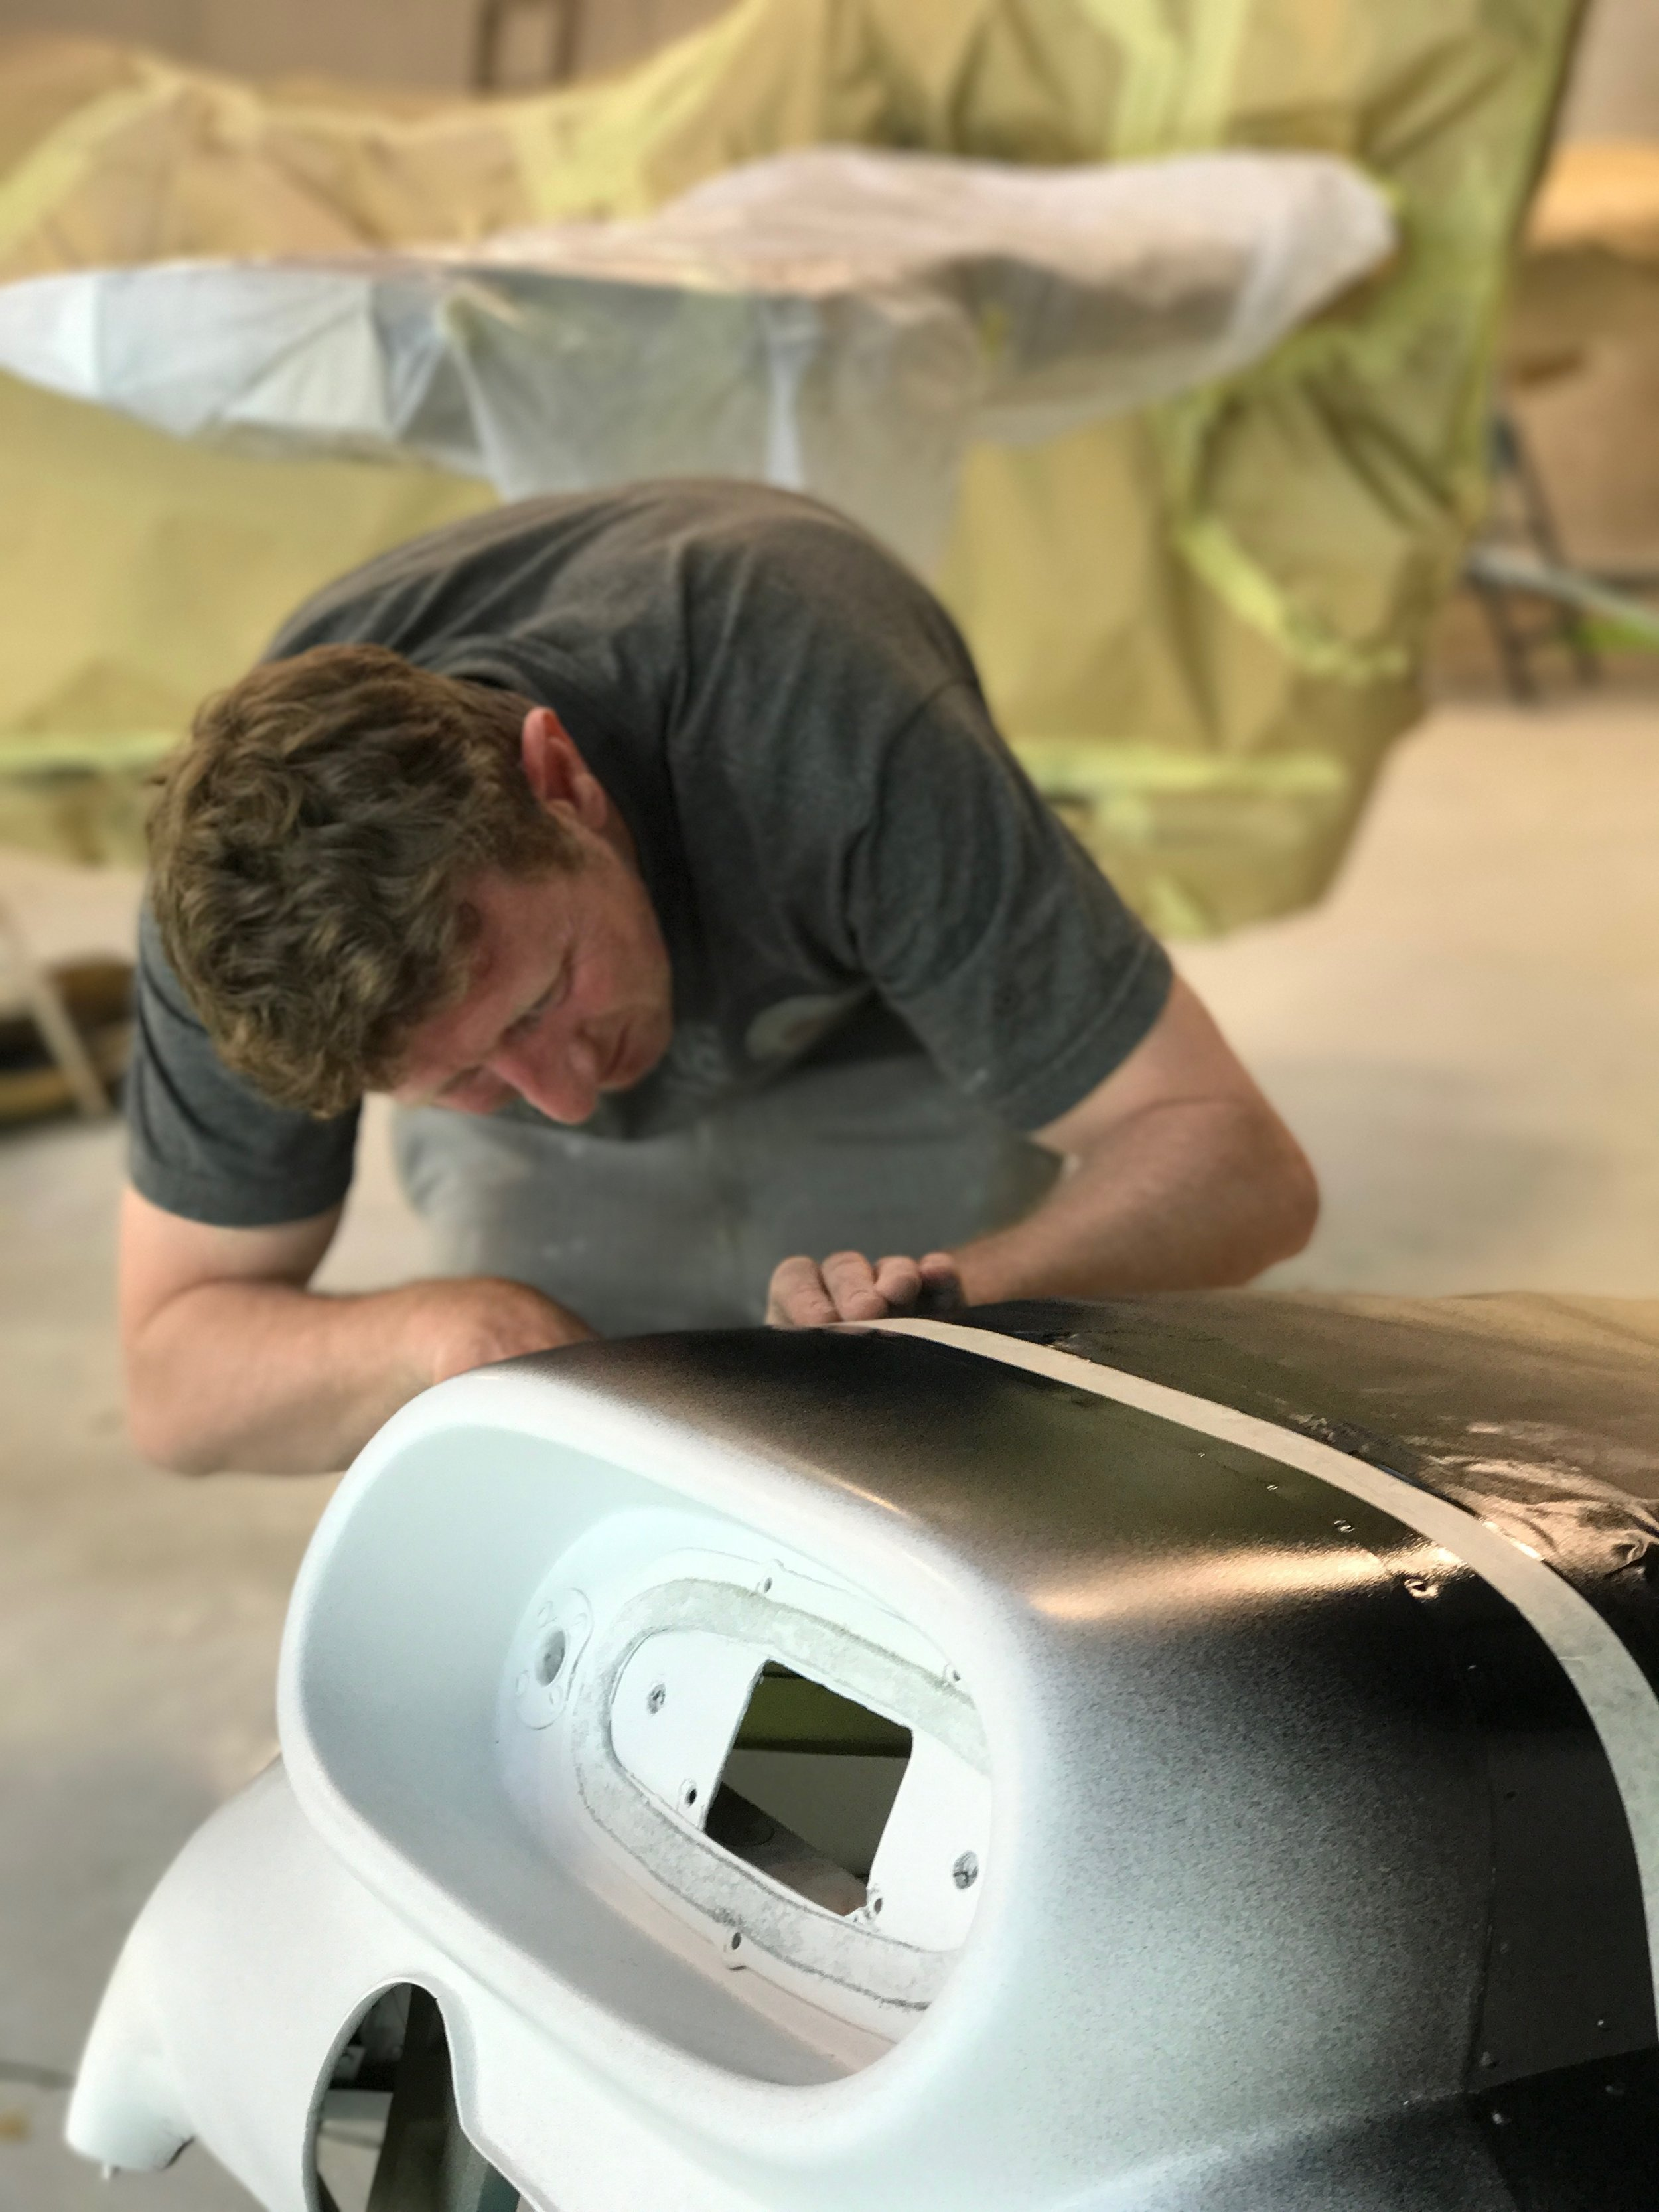 General Aviation Livery - Eshott Paint Shop